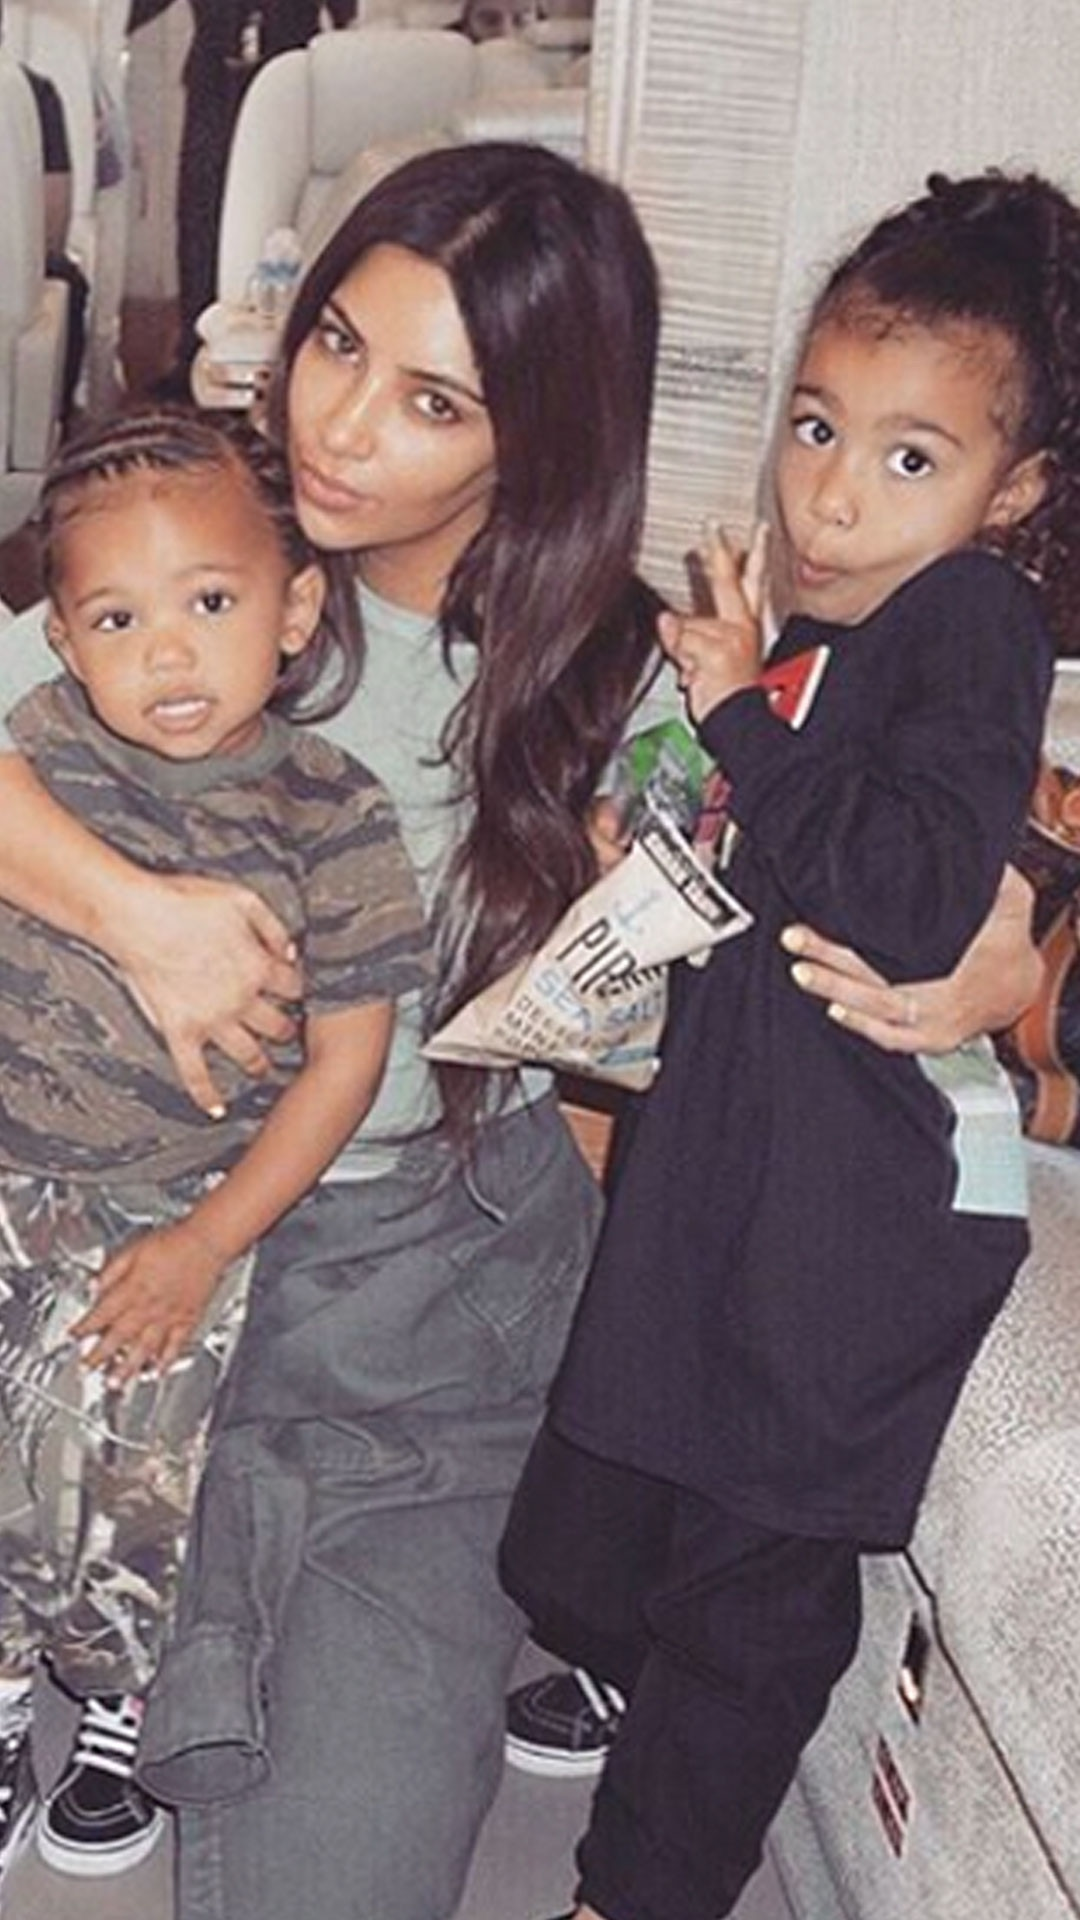 Kim Kardashian, Kanye West, Saint West, North West, Chicago West